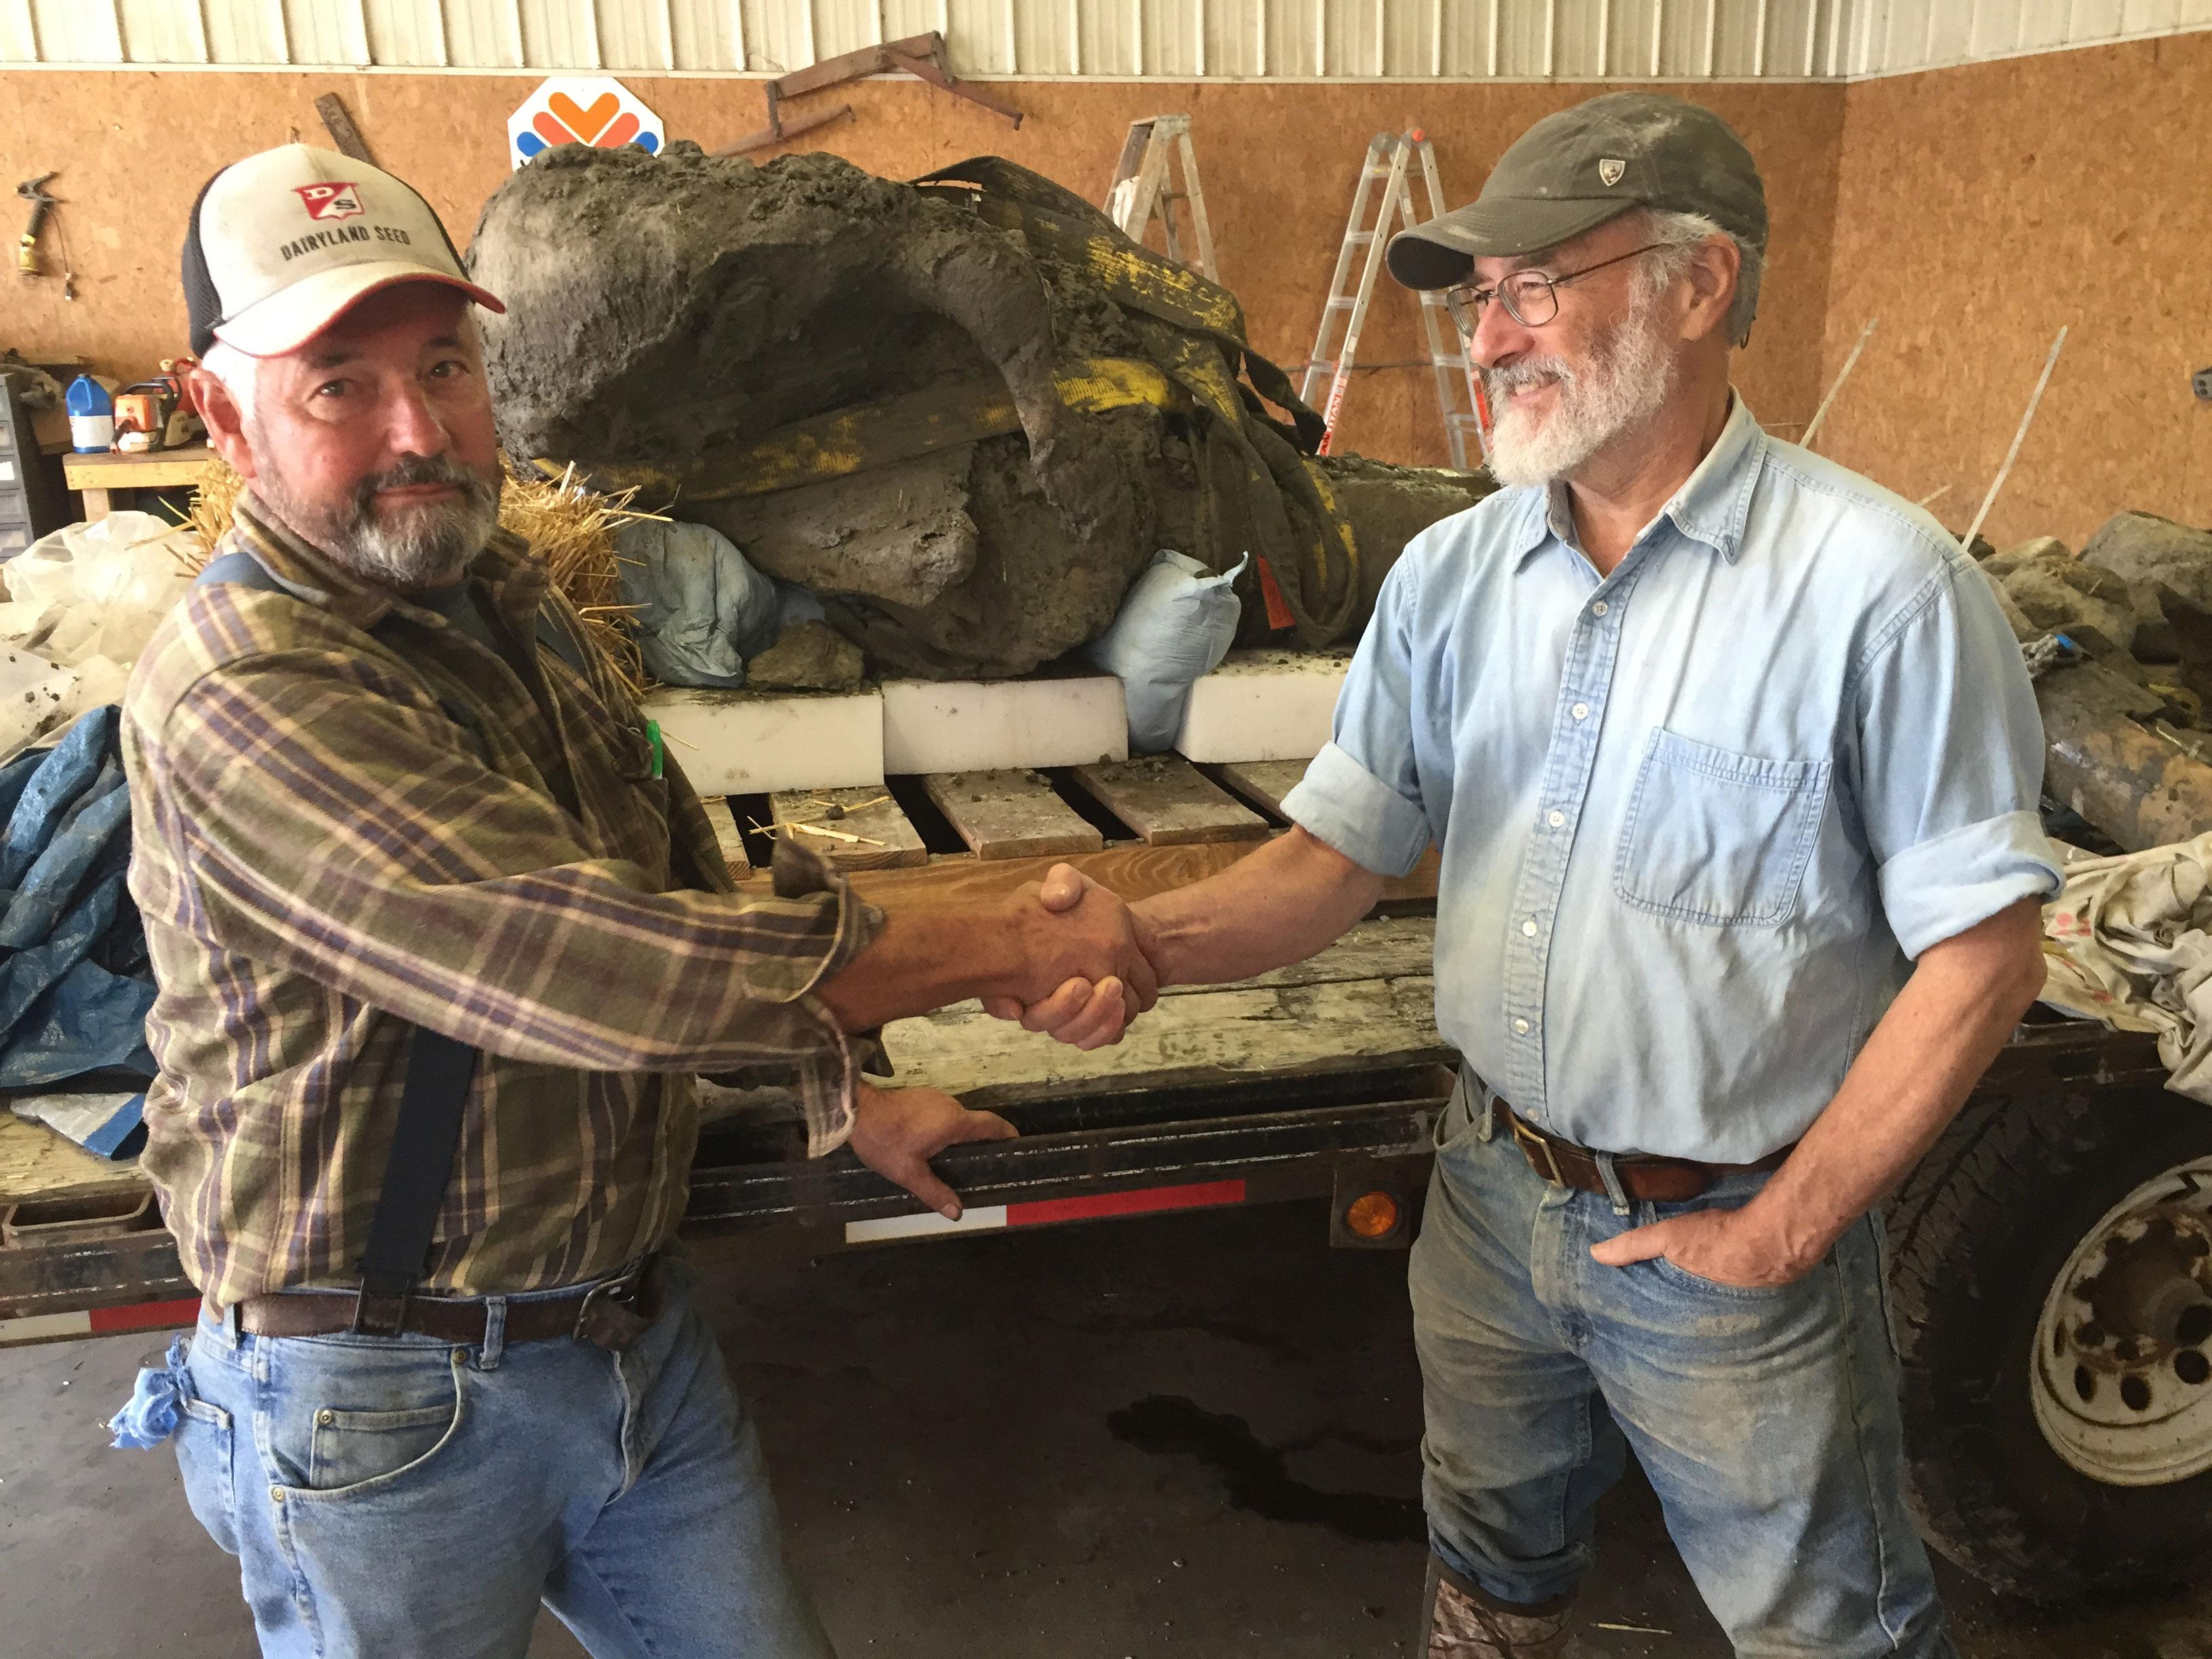 James Bristle, left, and Daniel Fisher, director of the U-M Museum of Paleontology. Image credit: University of Michigan